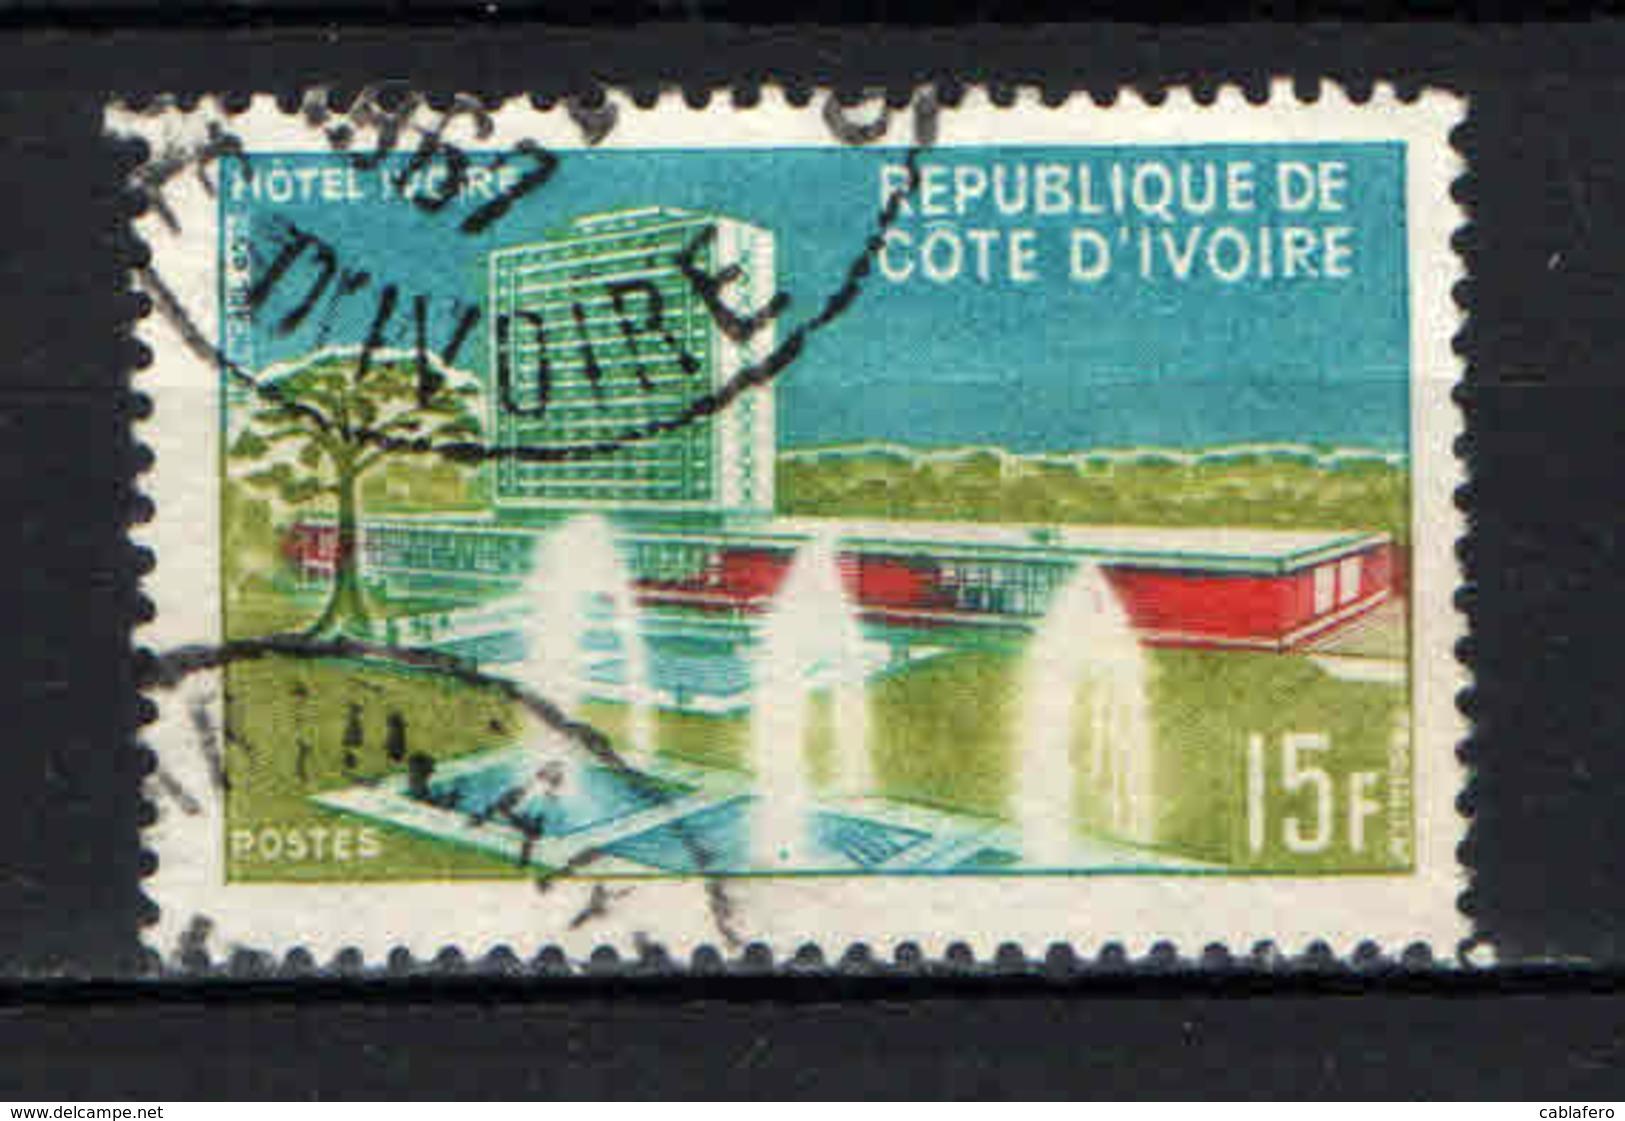 COSTA D'AVORIO - 1966 - HOTEL IVOIRE - USATO - Costa D'Avorio (1960-...)